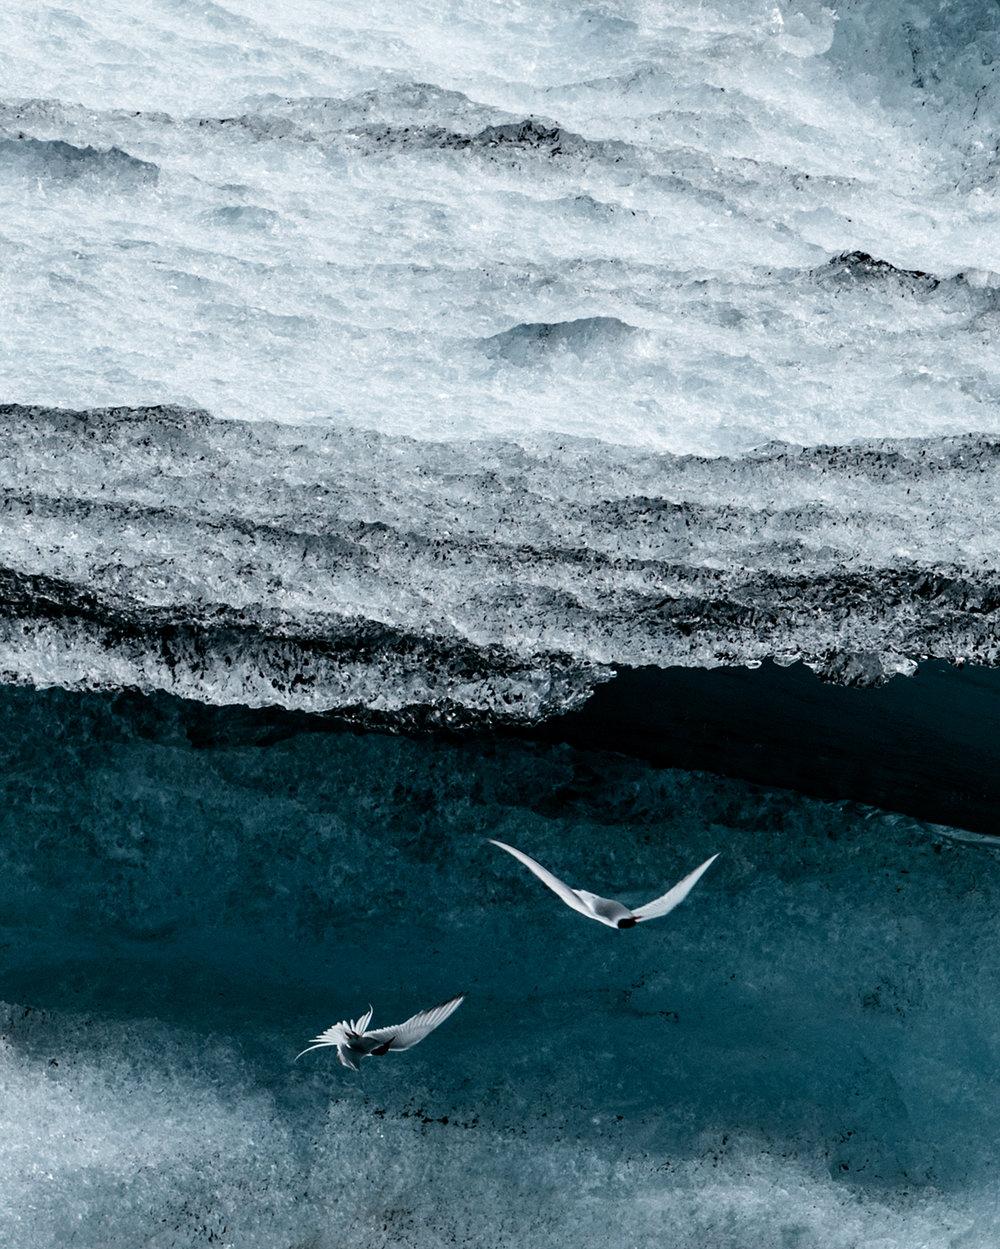 iceland_cold_1.jpg